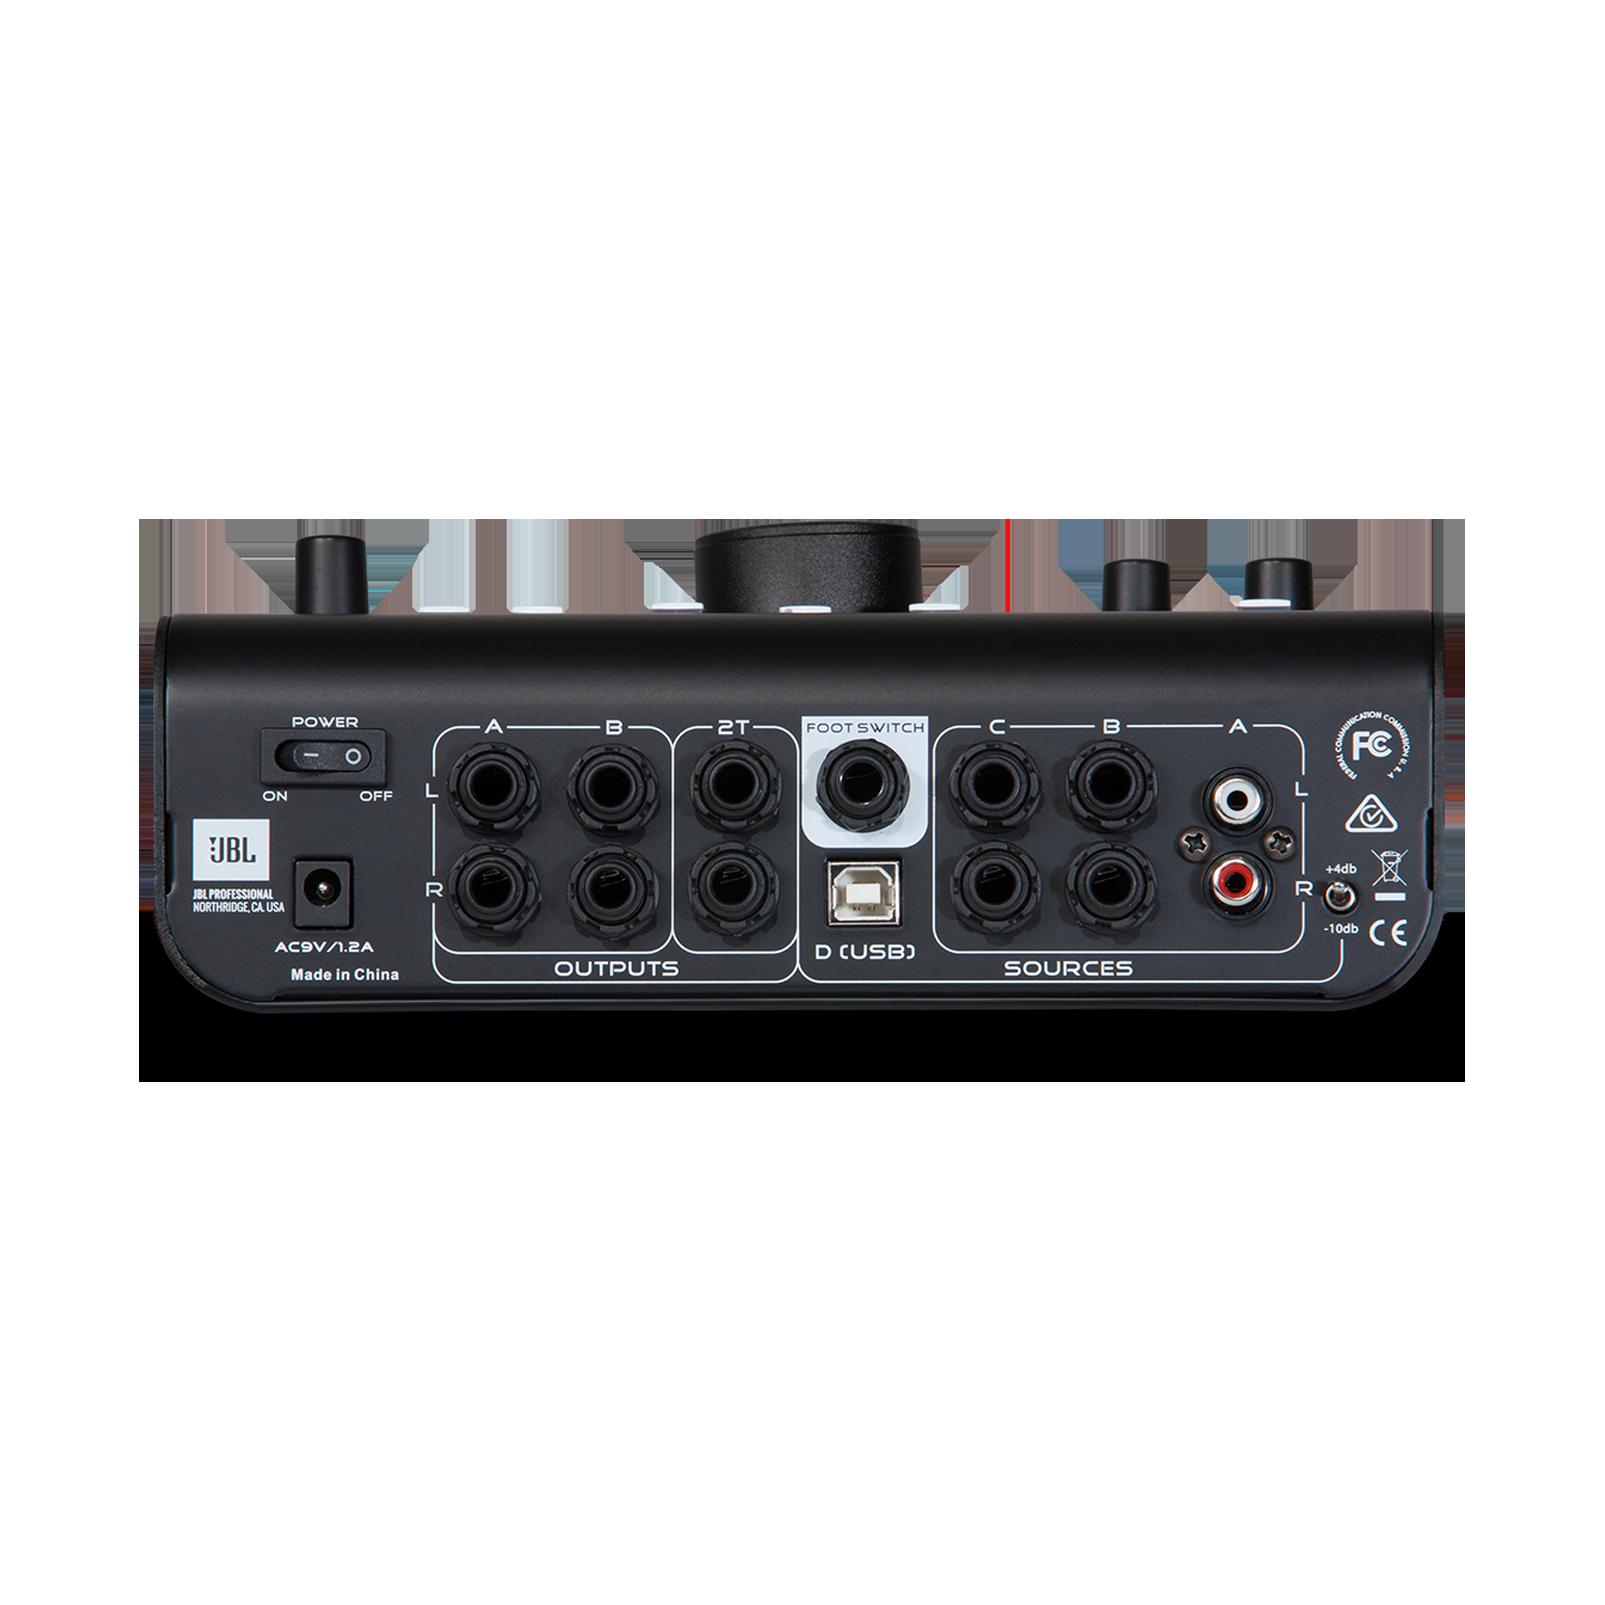 JBL M-Patch Active-1 - Black - Precision Monitor Control Plus Studio Talkback and USB Audio I/O - Back